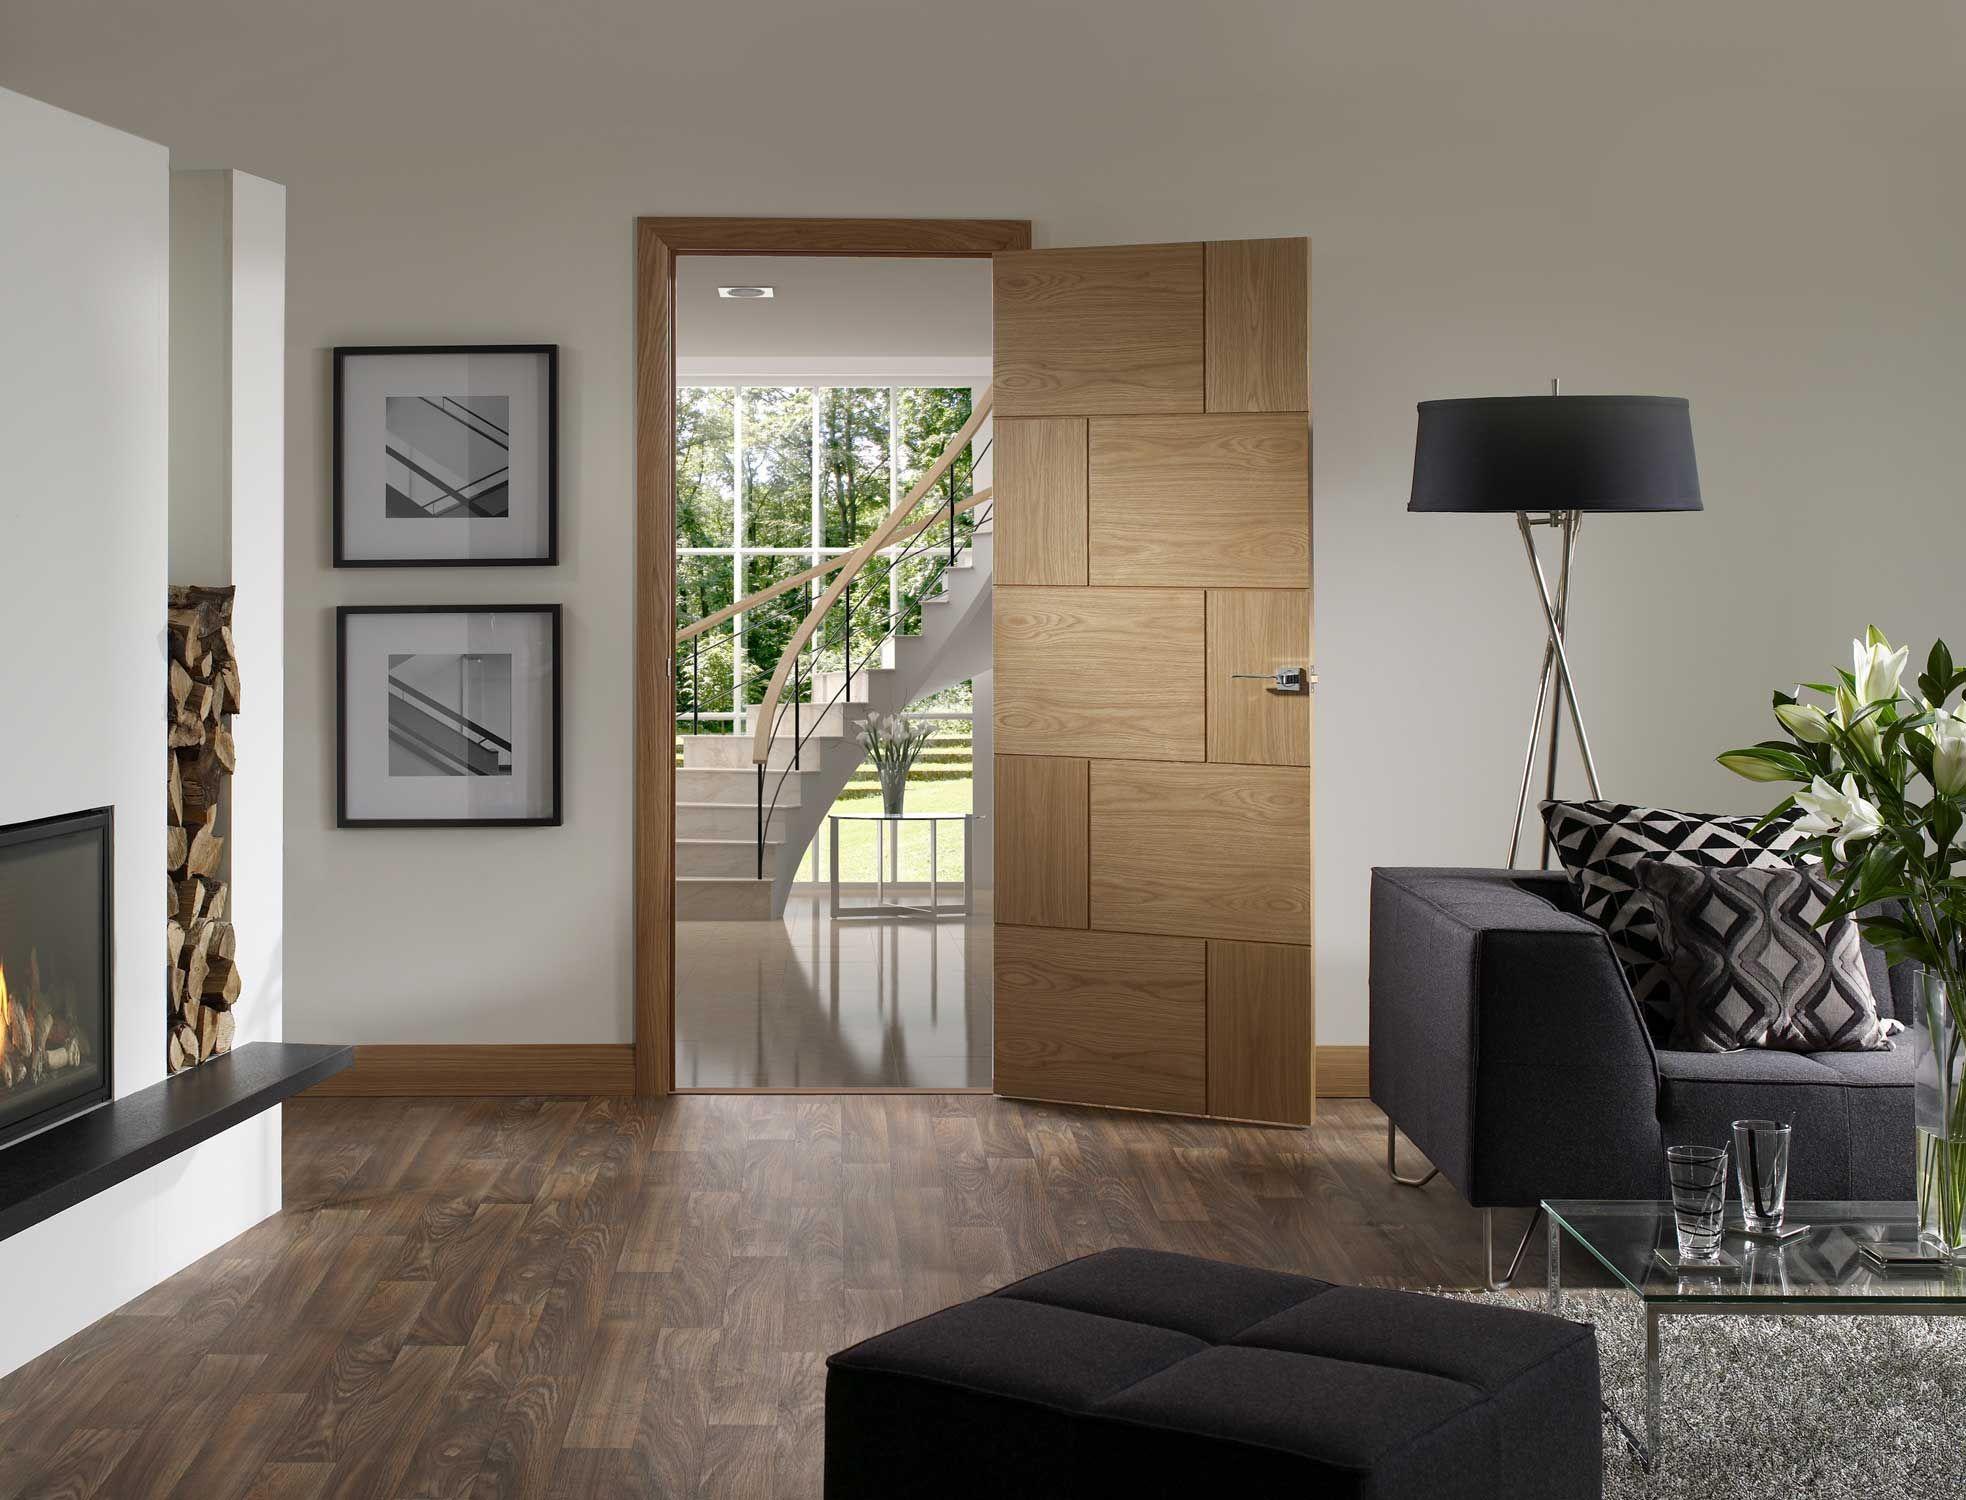 interior oak effect doors   Modern Interior Doors Design Ideas 2015 ...